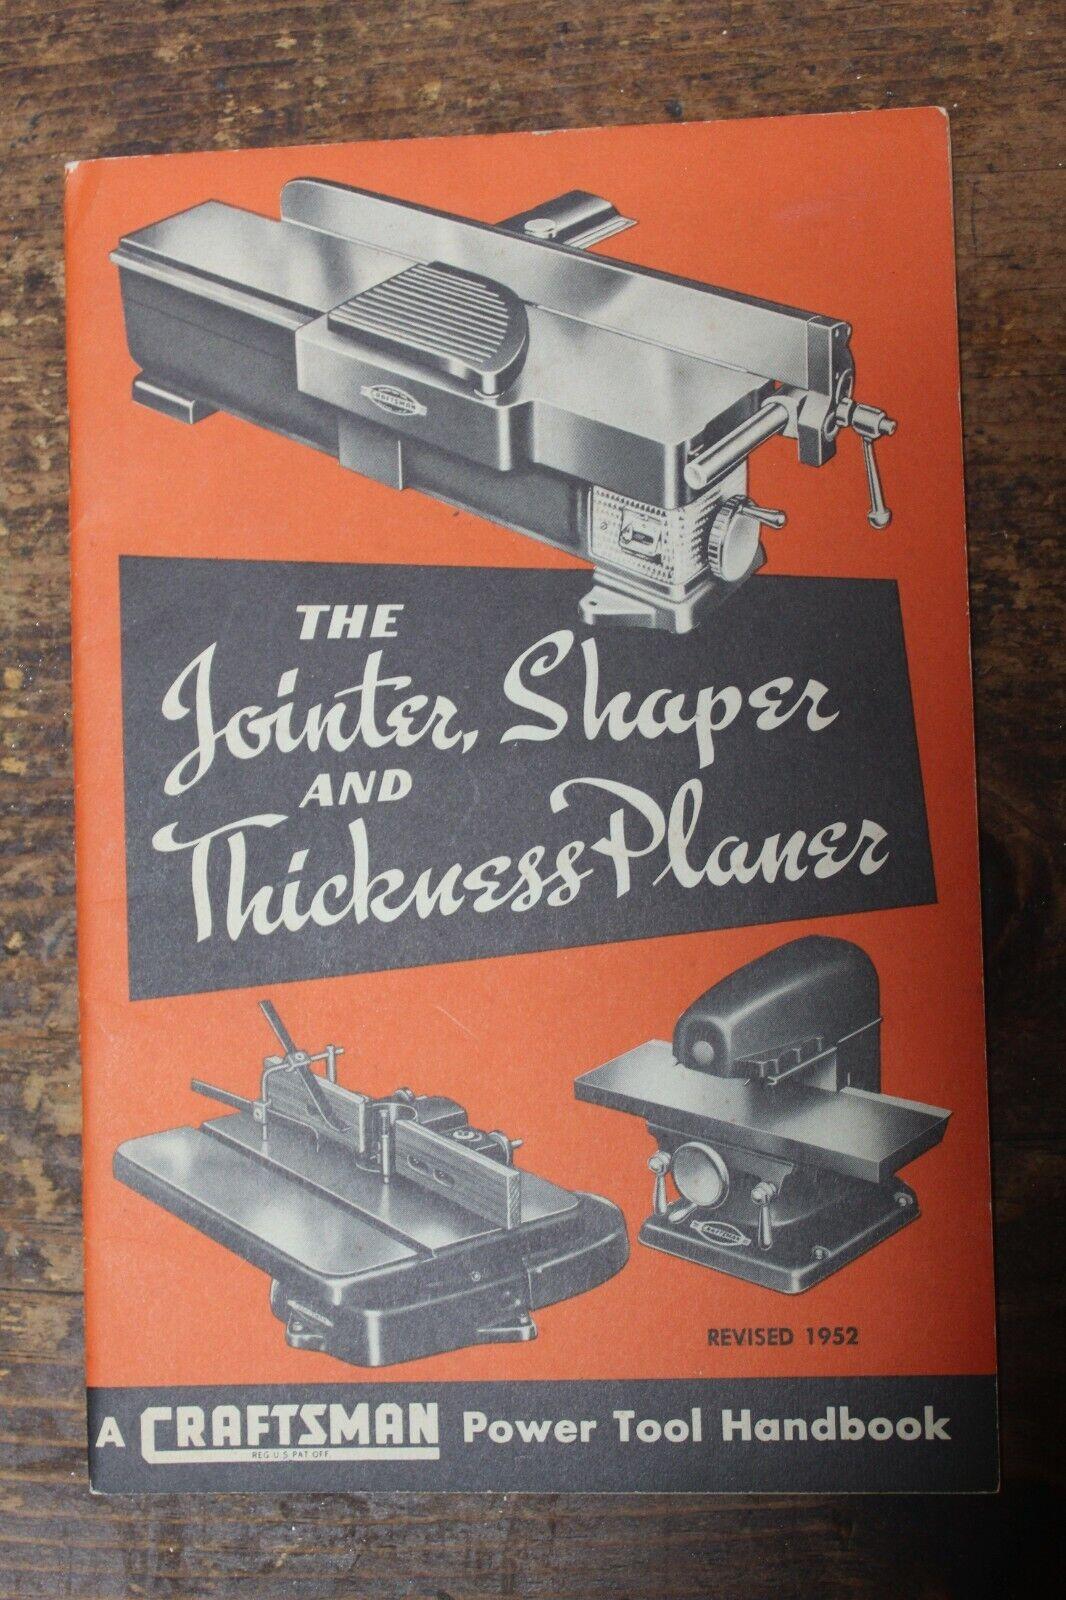 Craftsman JOINTER SHAPER THICKNESS PLANER Power Tool Handbook 1952, Nice